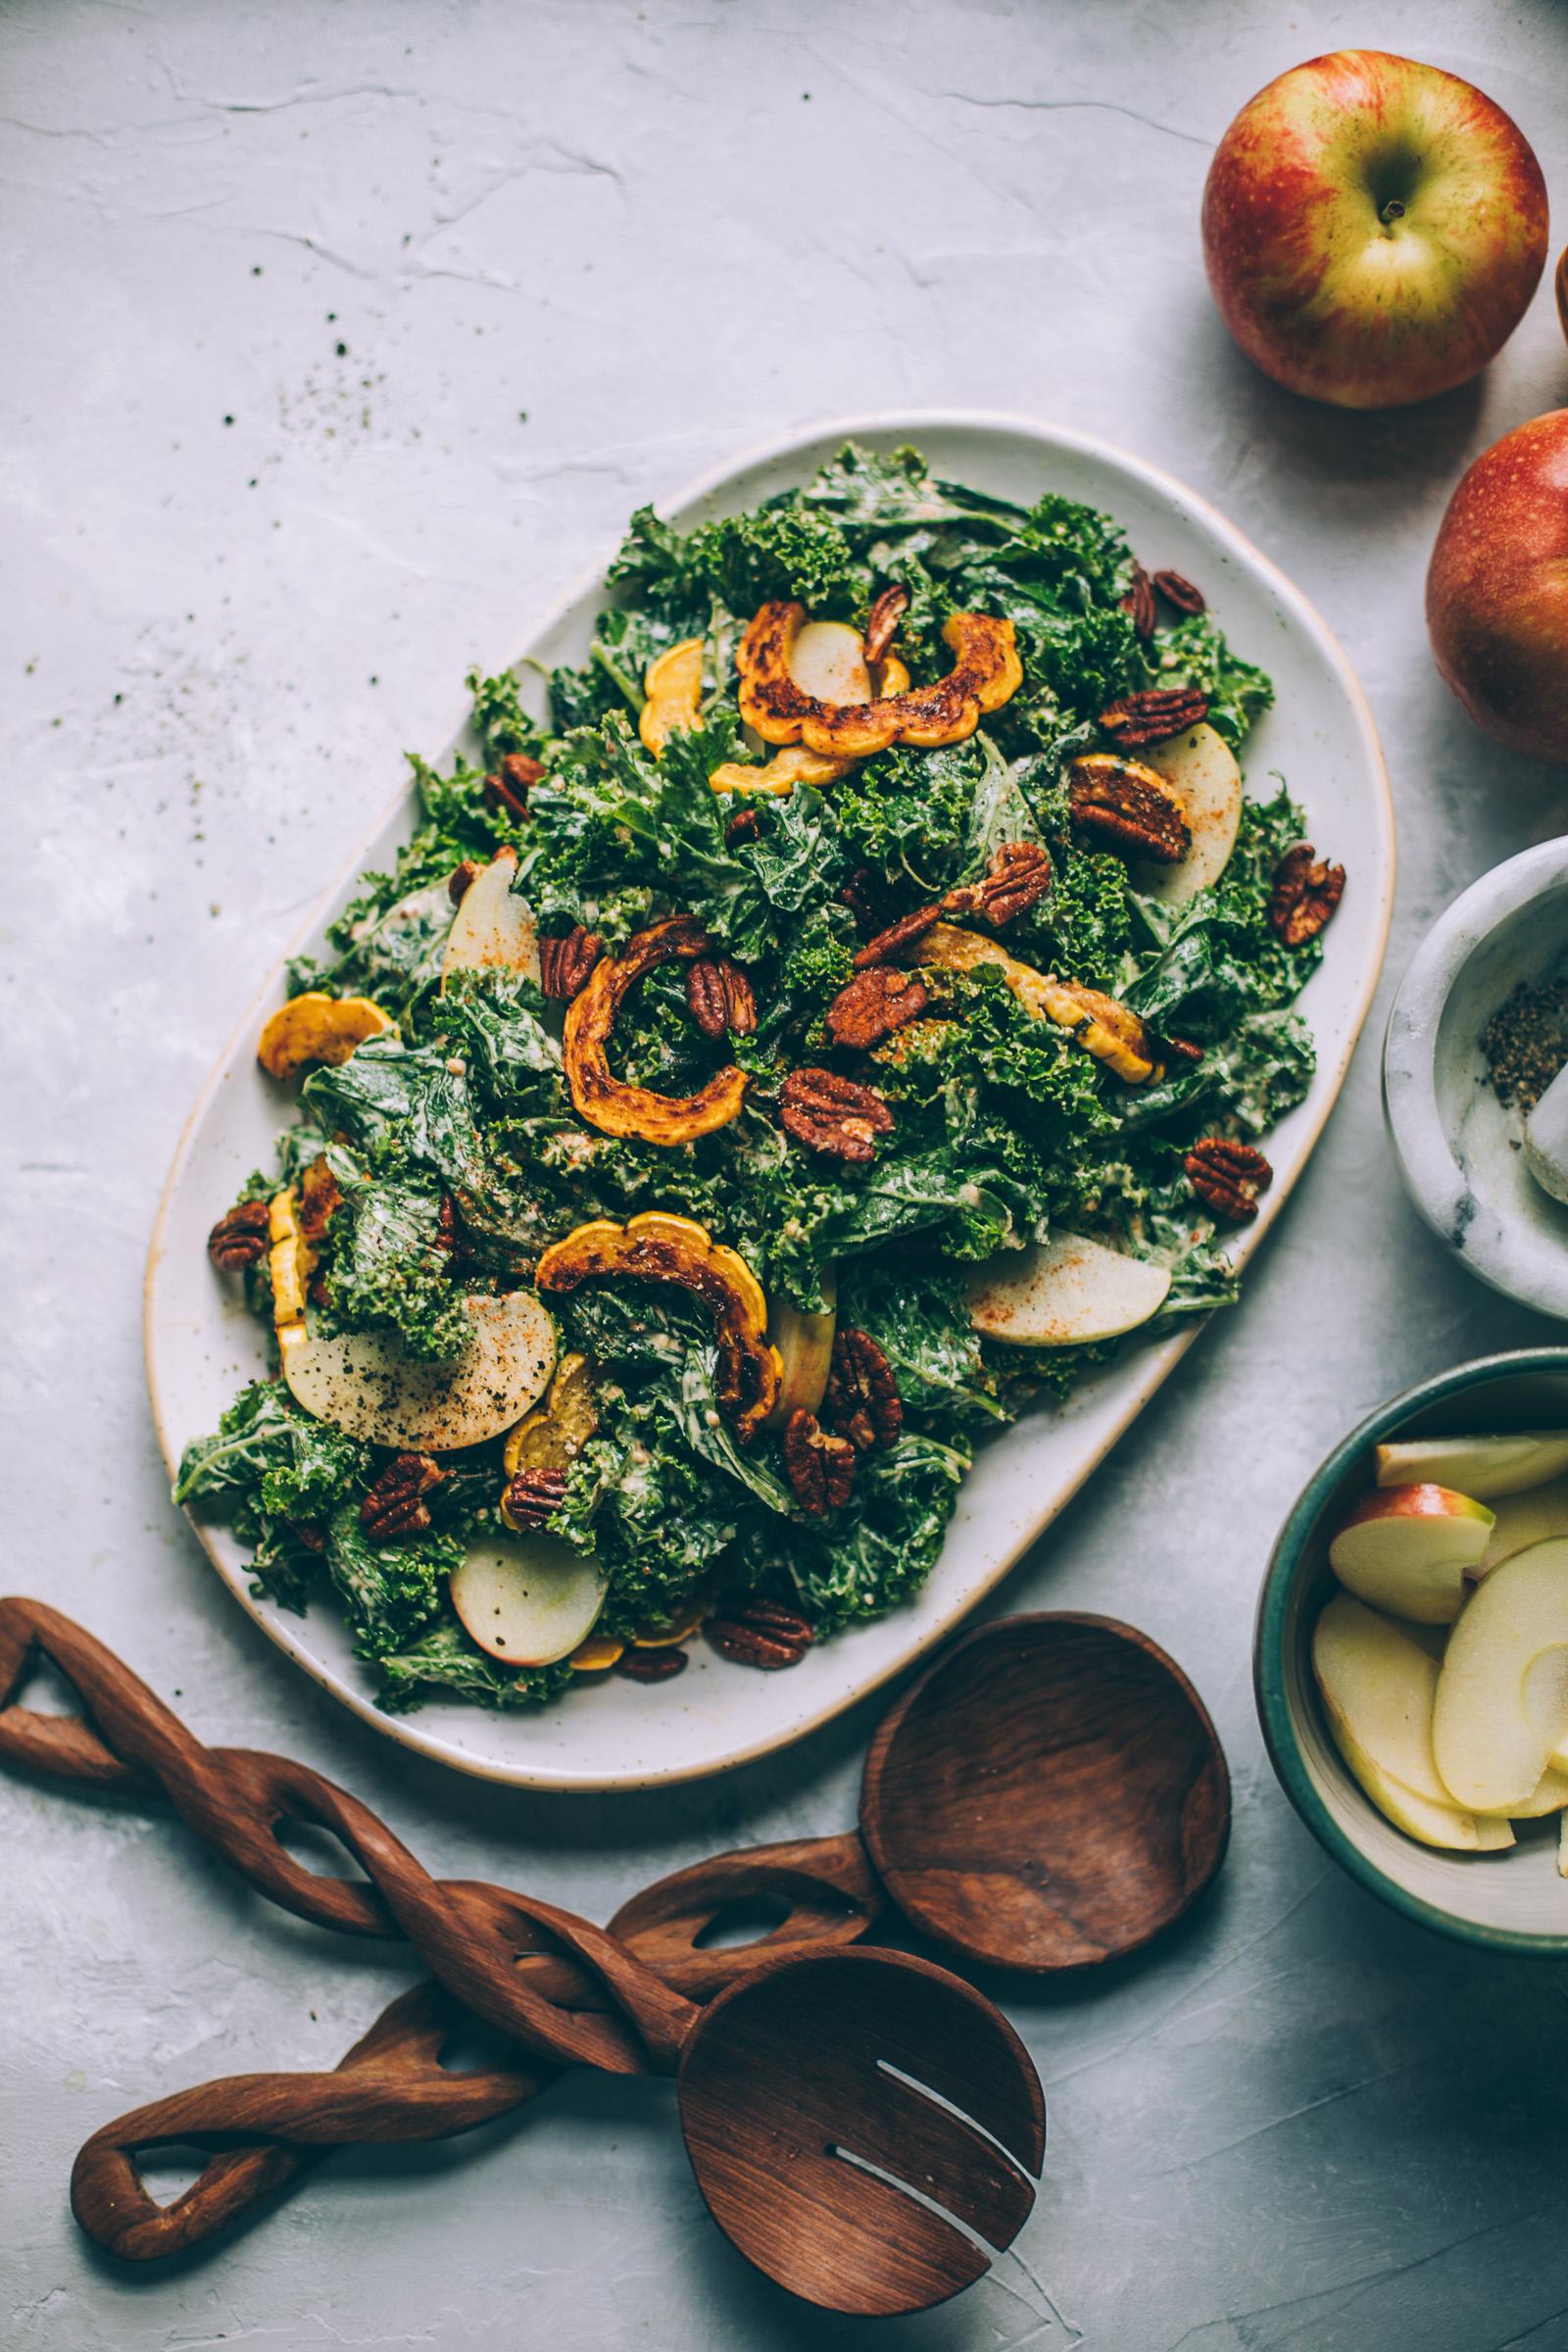 Harvest Moon Kale Caesar Salad with Cashew Maple Dijon Dressing + roasted delicata squash, apples and tamari pecans